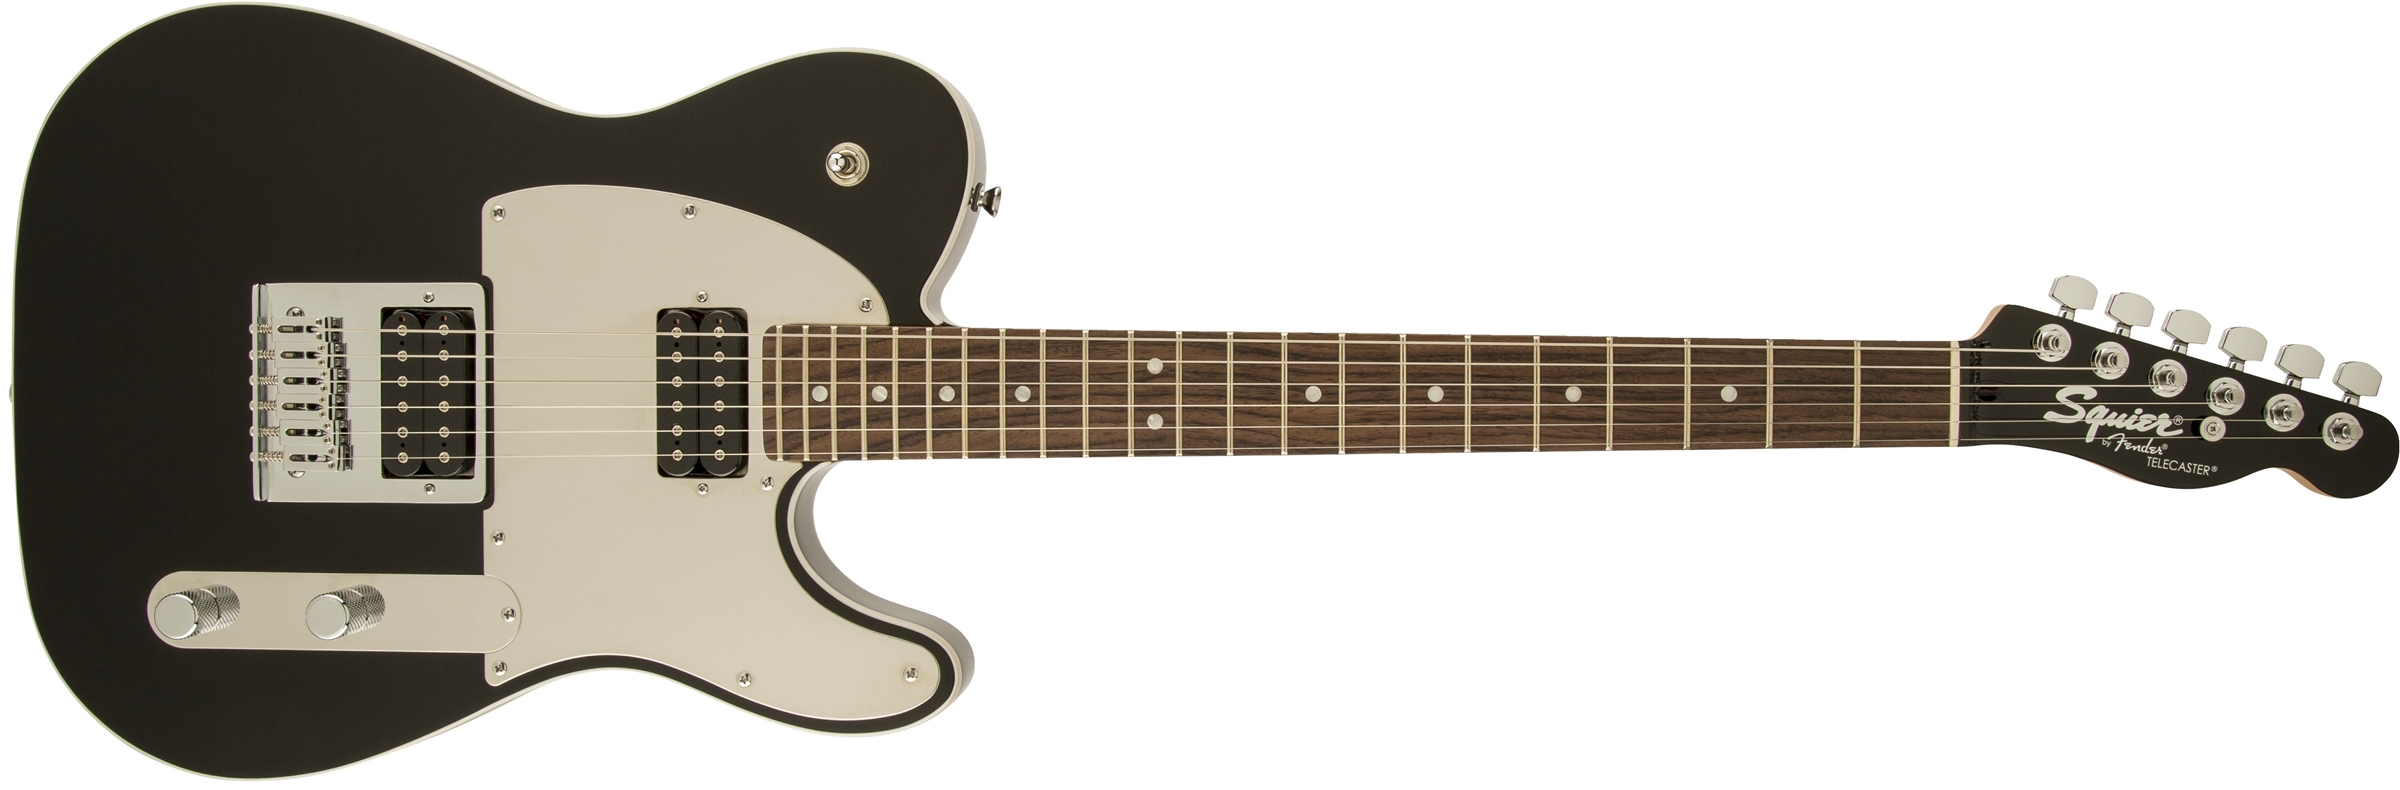 J5 Telecaster Wiring Diagram Quick Start Guide Of Signature Fender Strat Diagrams Squier Black Rh Webemusic Com 3 Way Switch